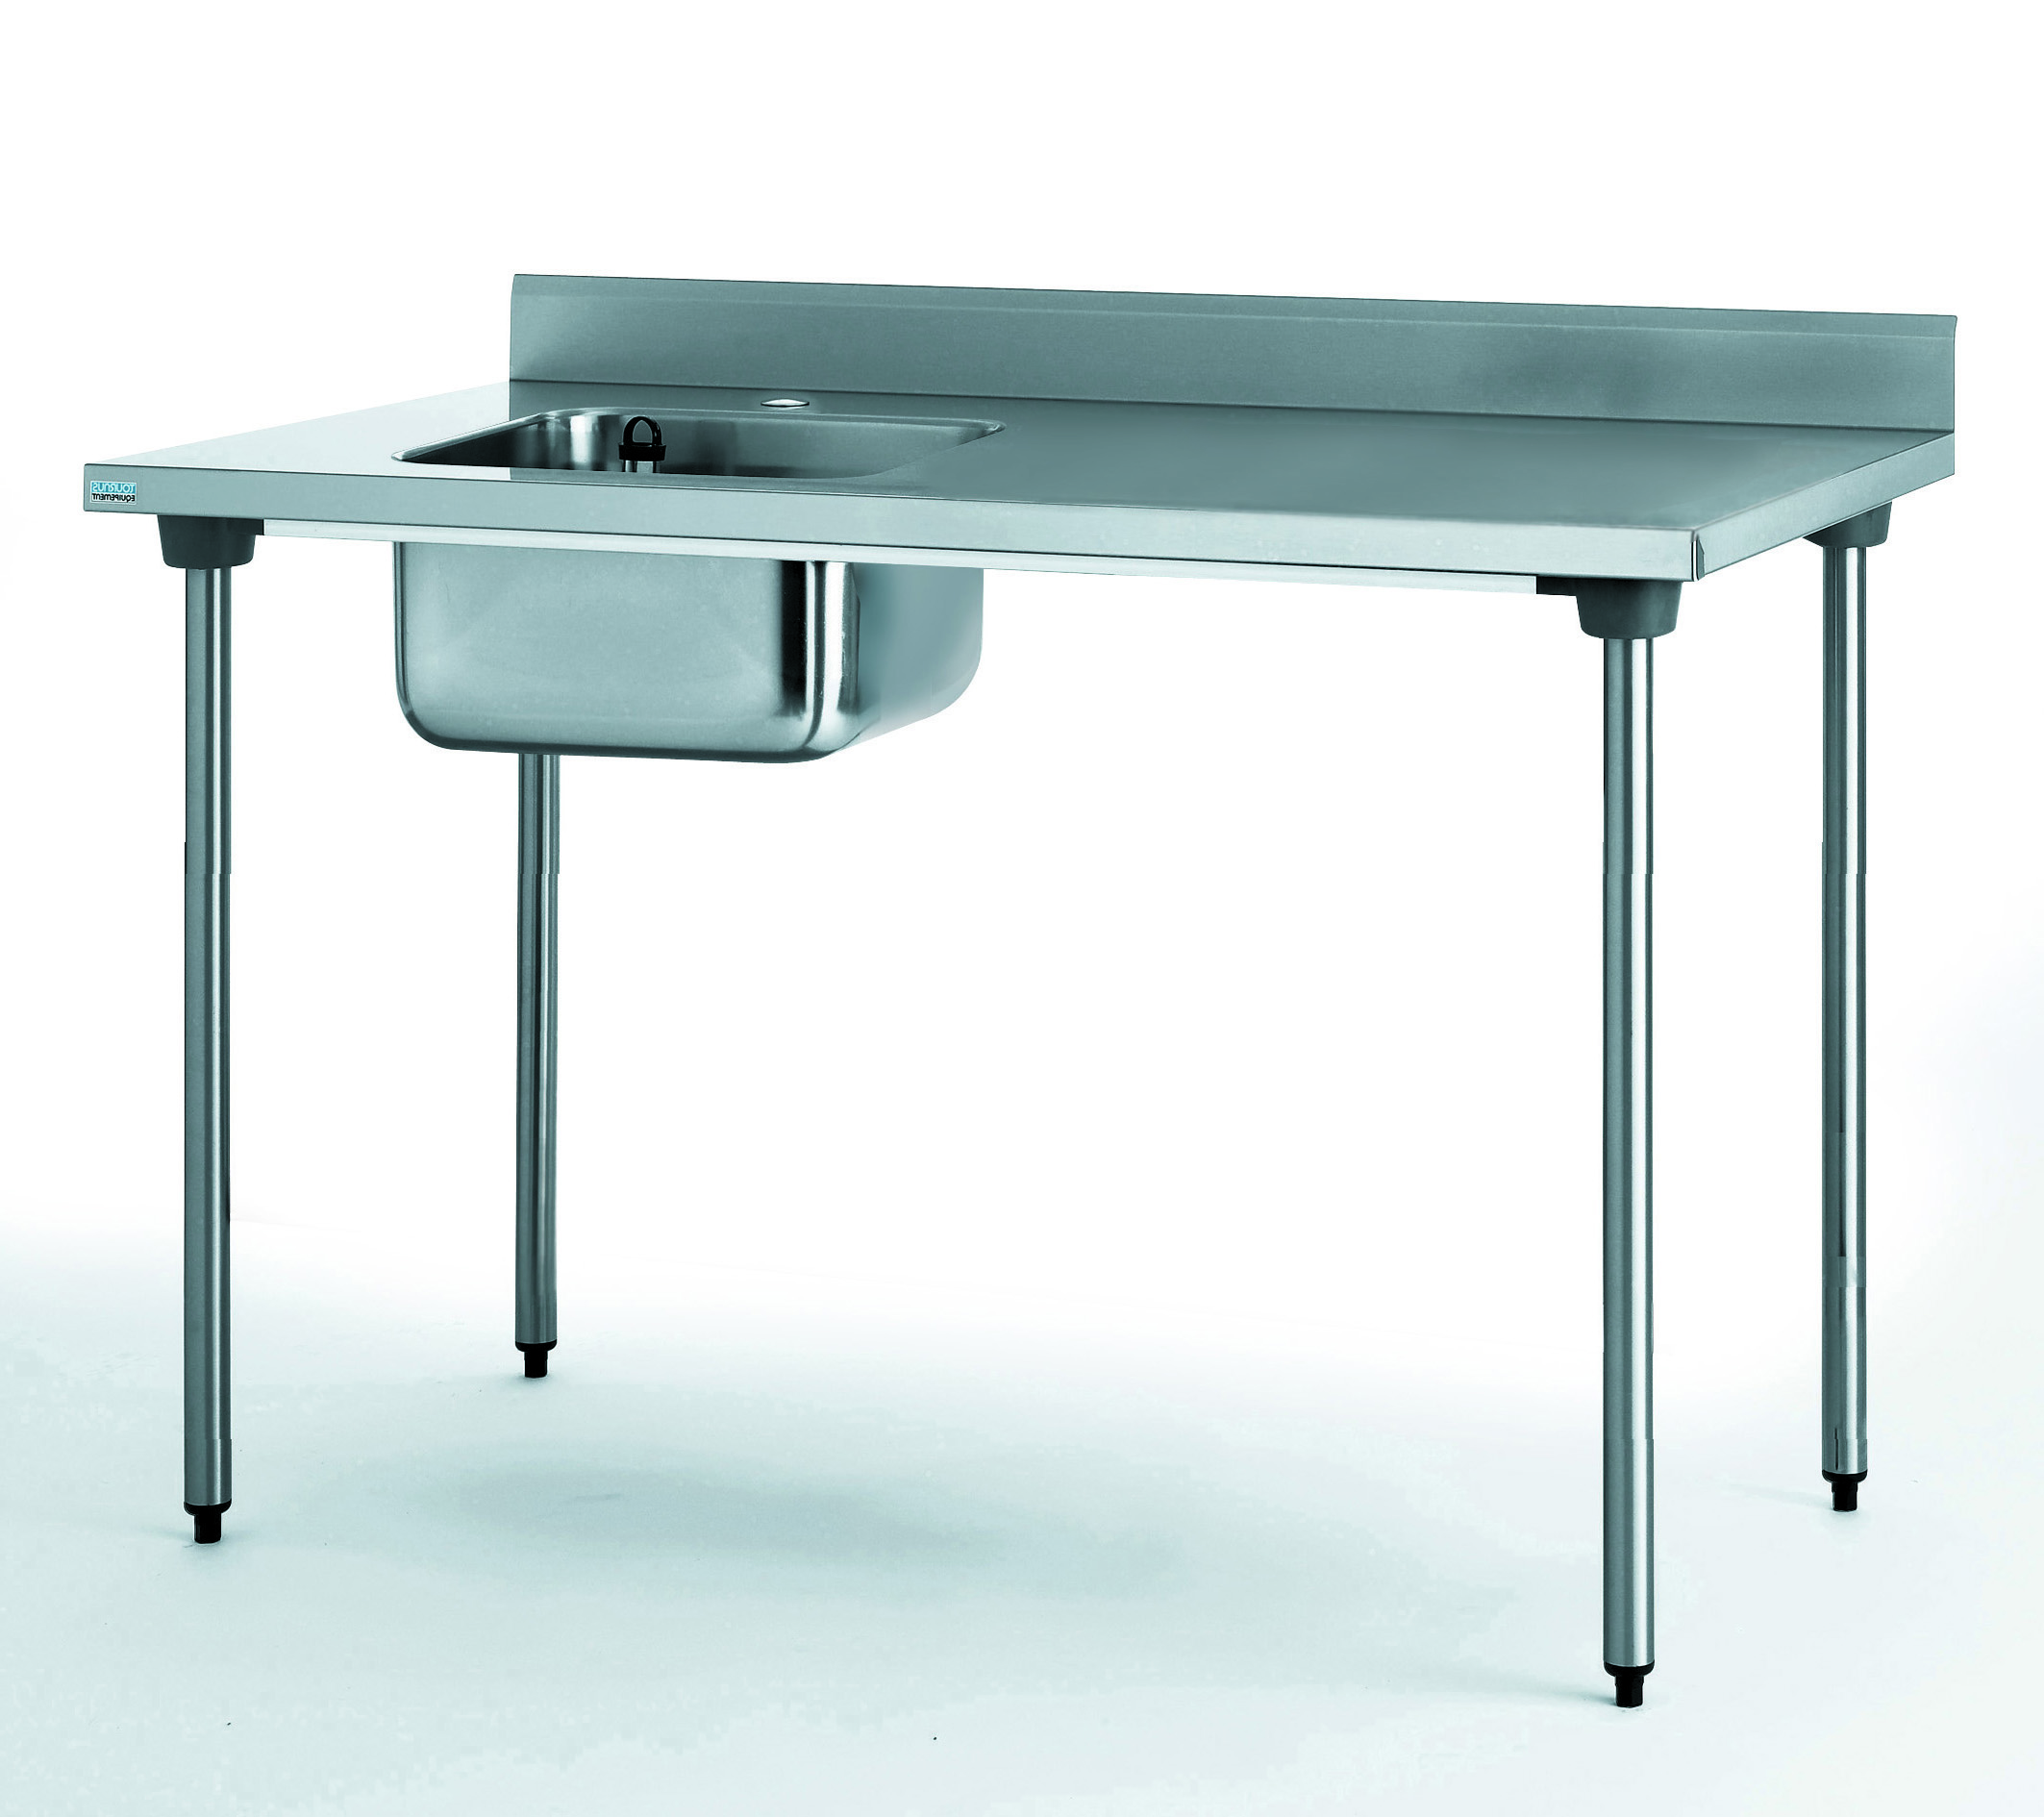 TABLE DU CHEF CHR 700X1600 BAC A GAUCHE SANS ROBINET